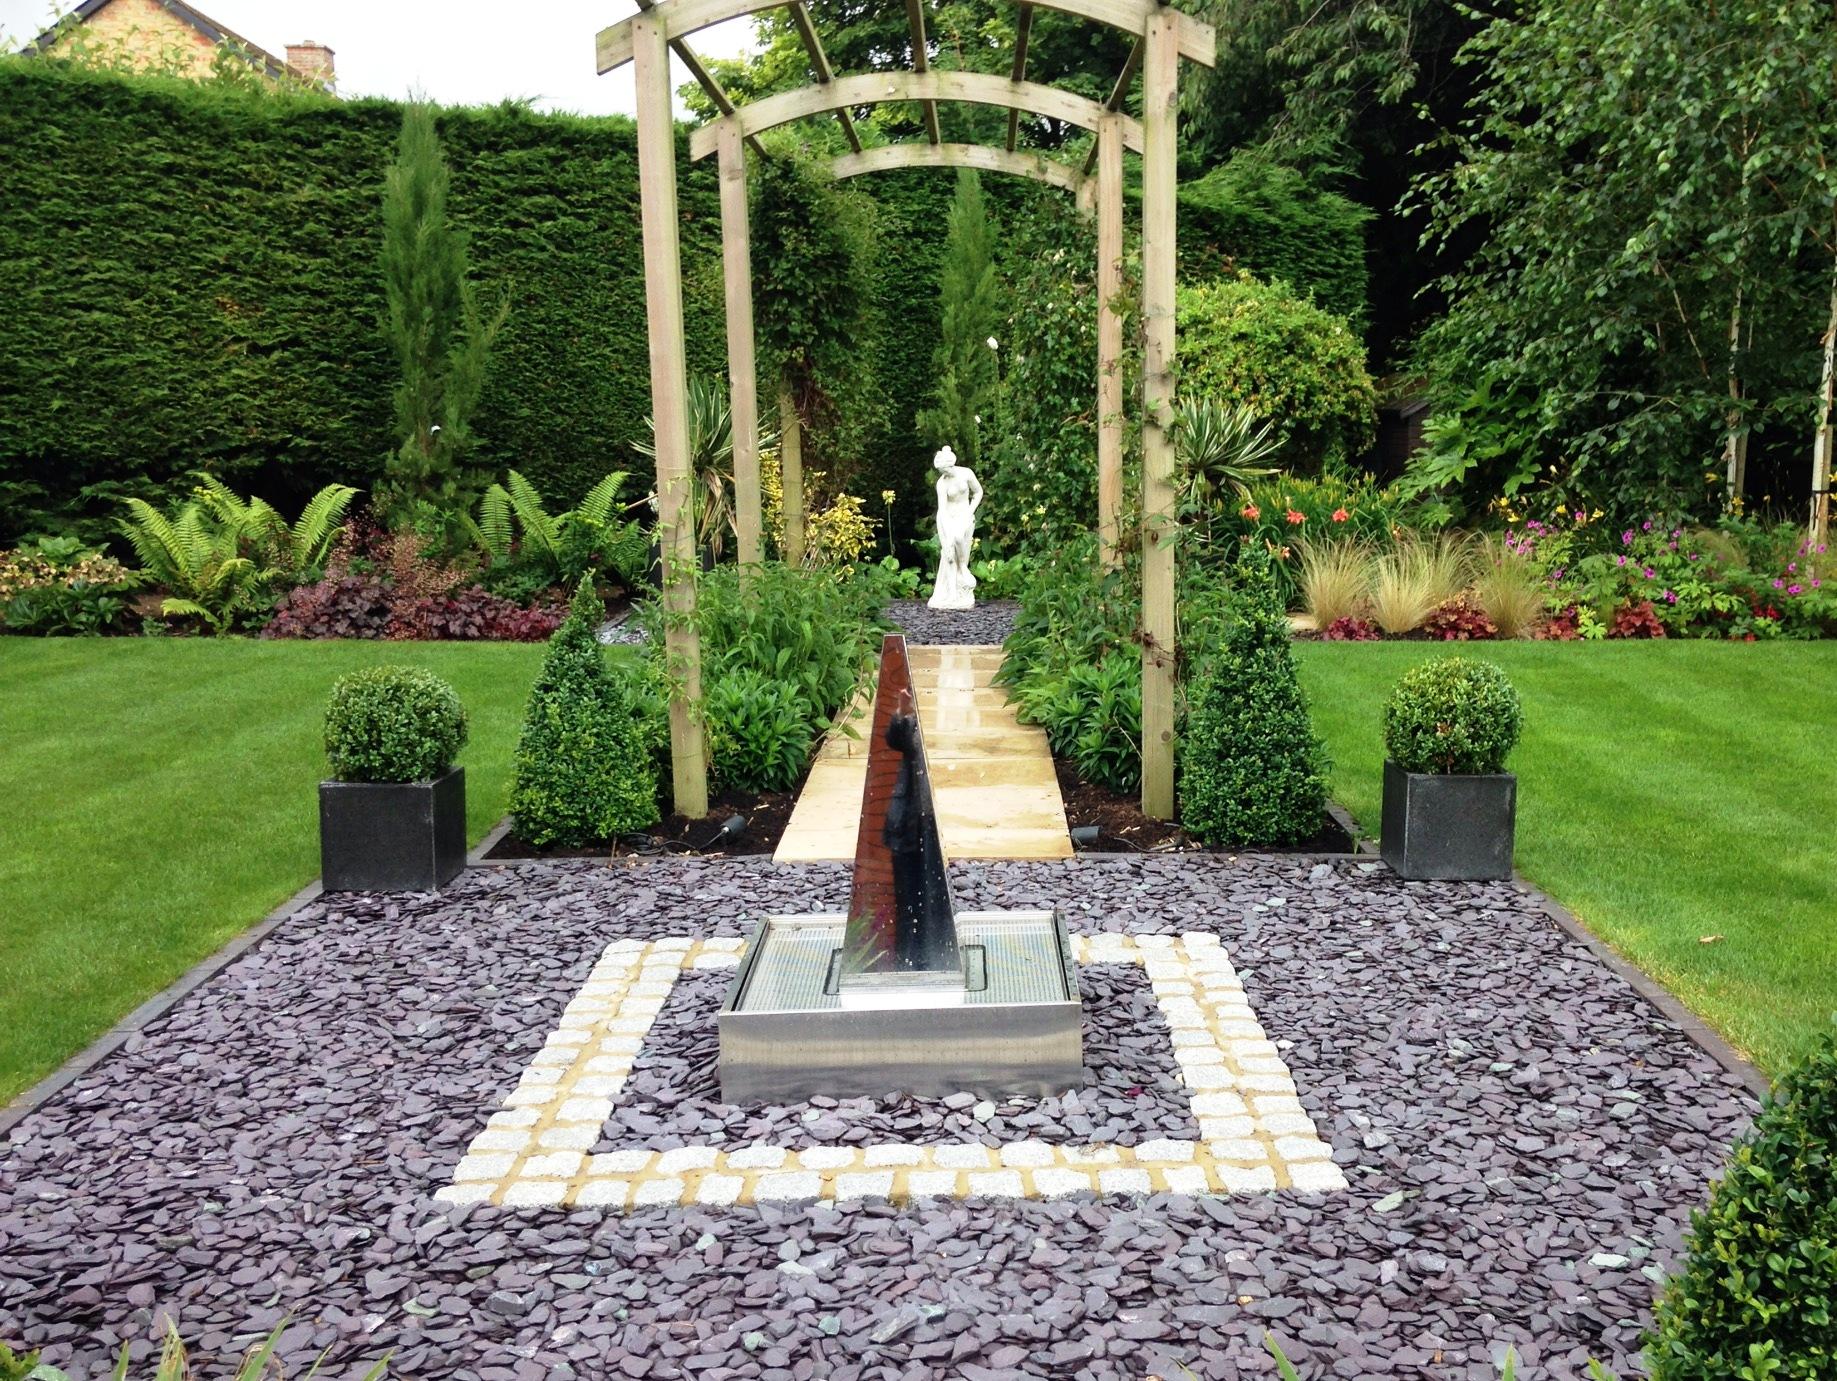 Contemporary garden design swindon wiltshire rhs medal for Suzhou architecture gardens landscape planning design company limited